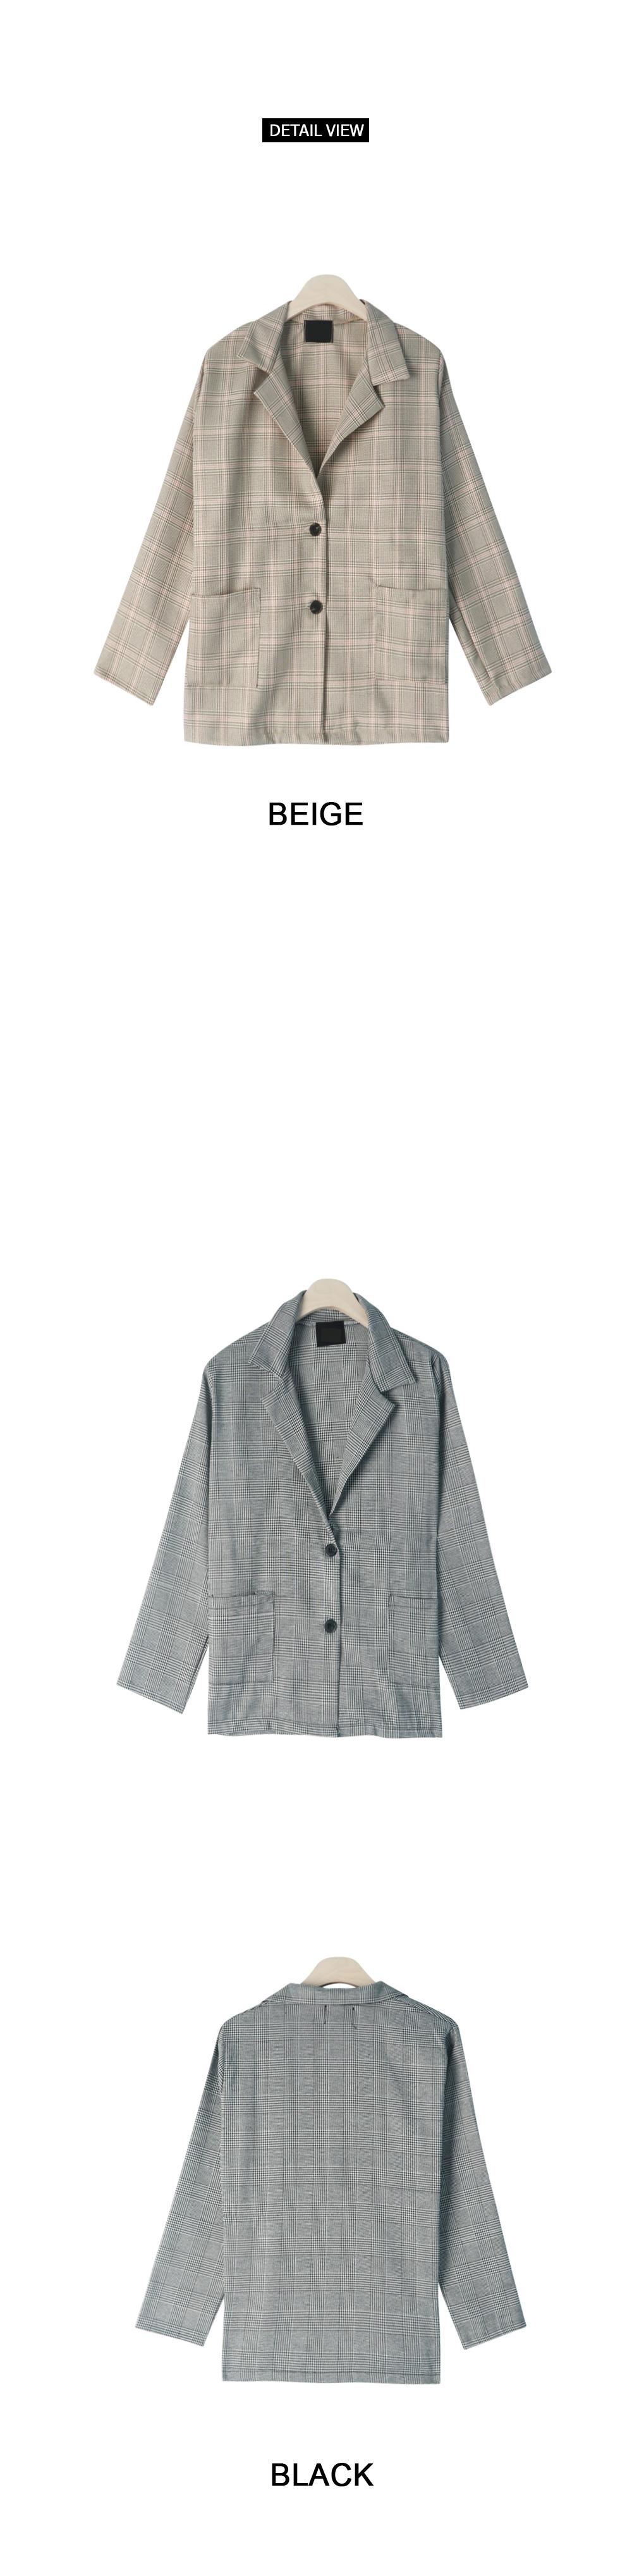 Ada spring check jacket